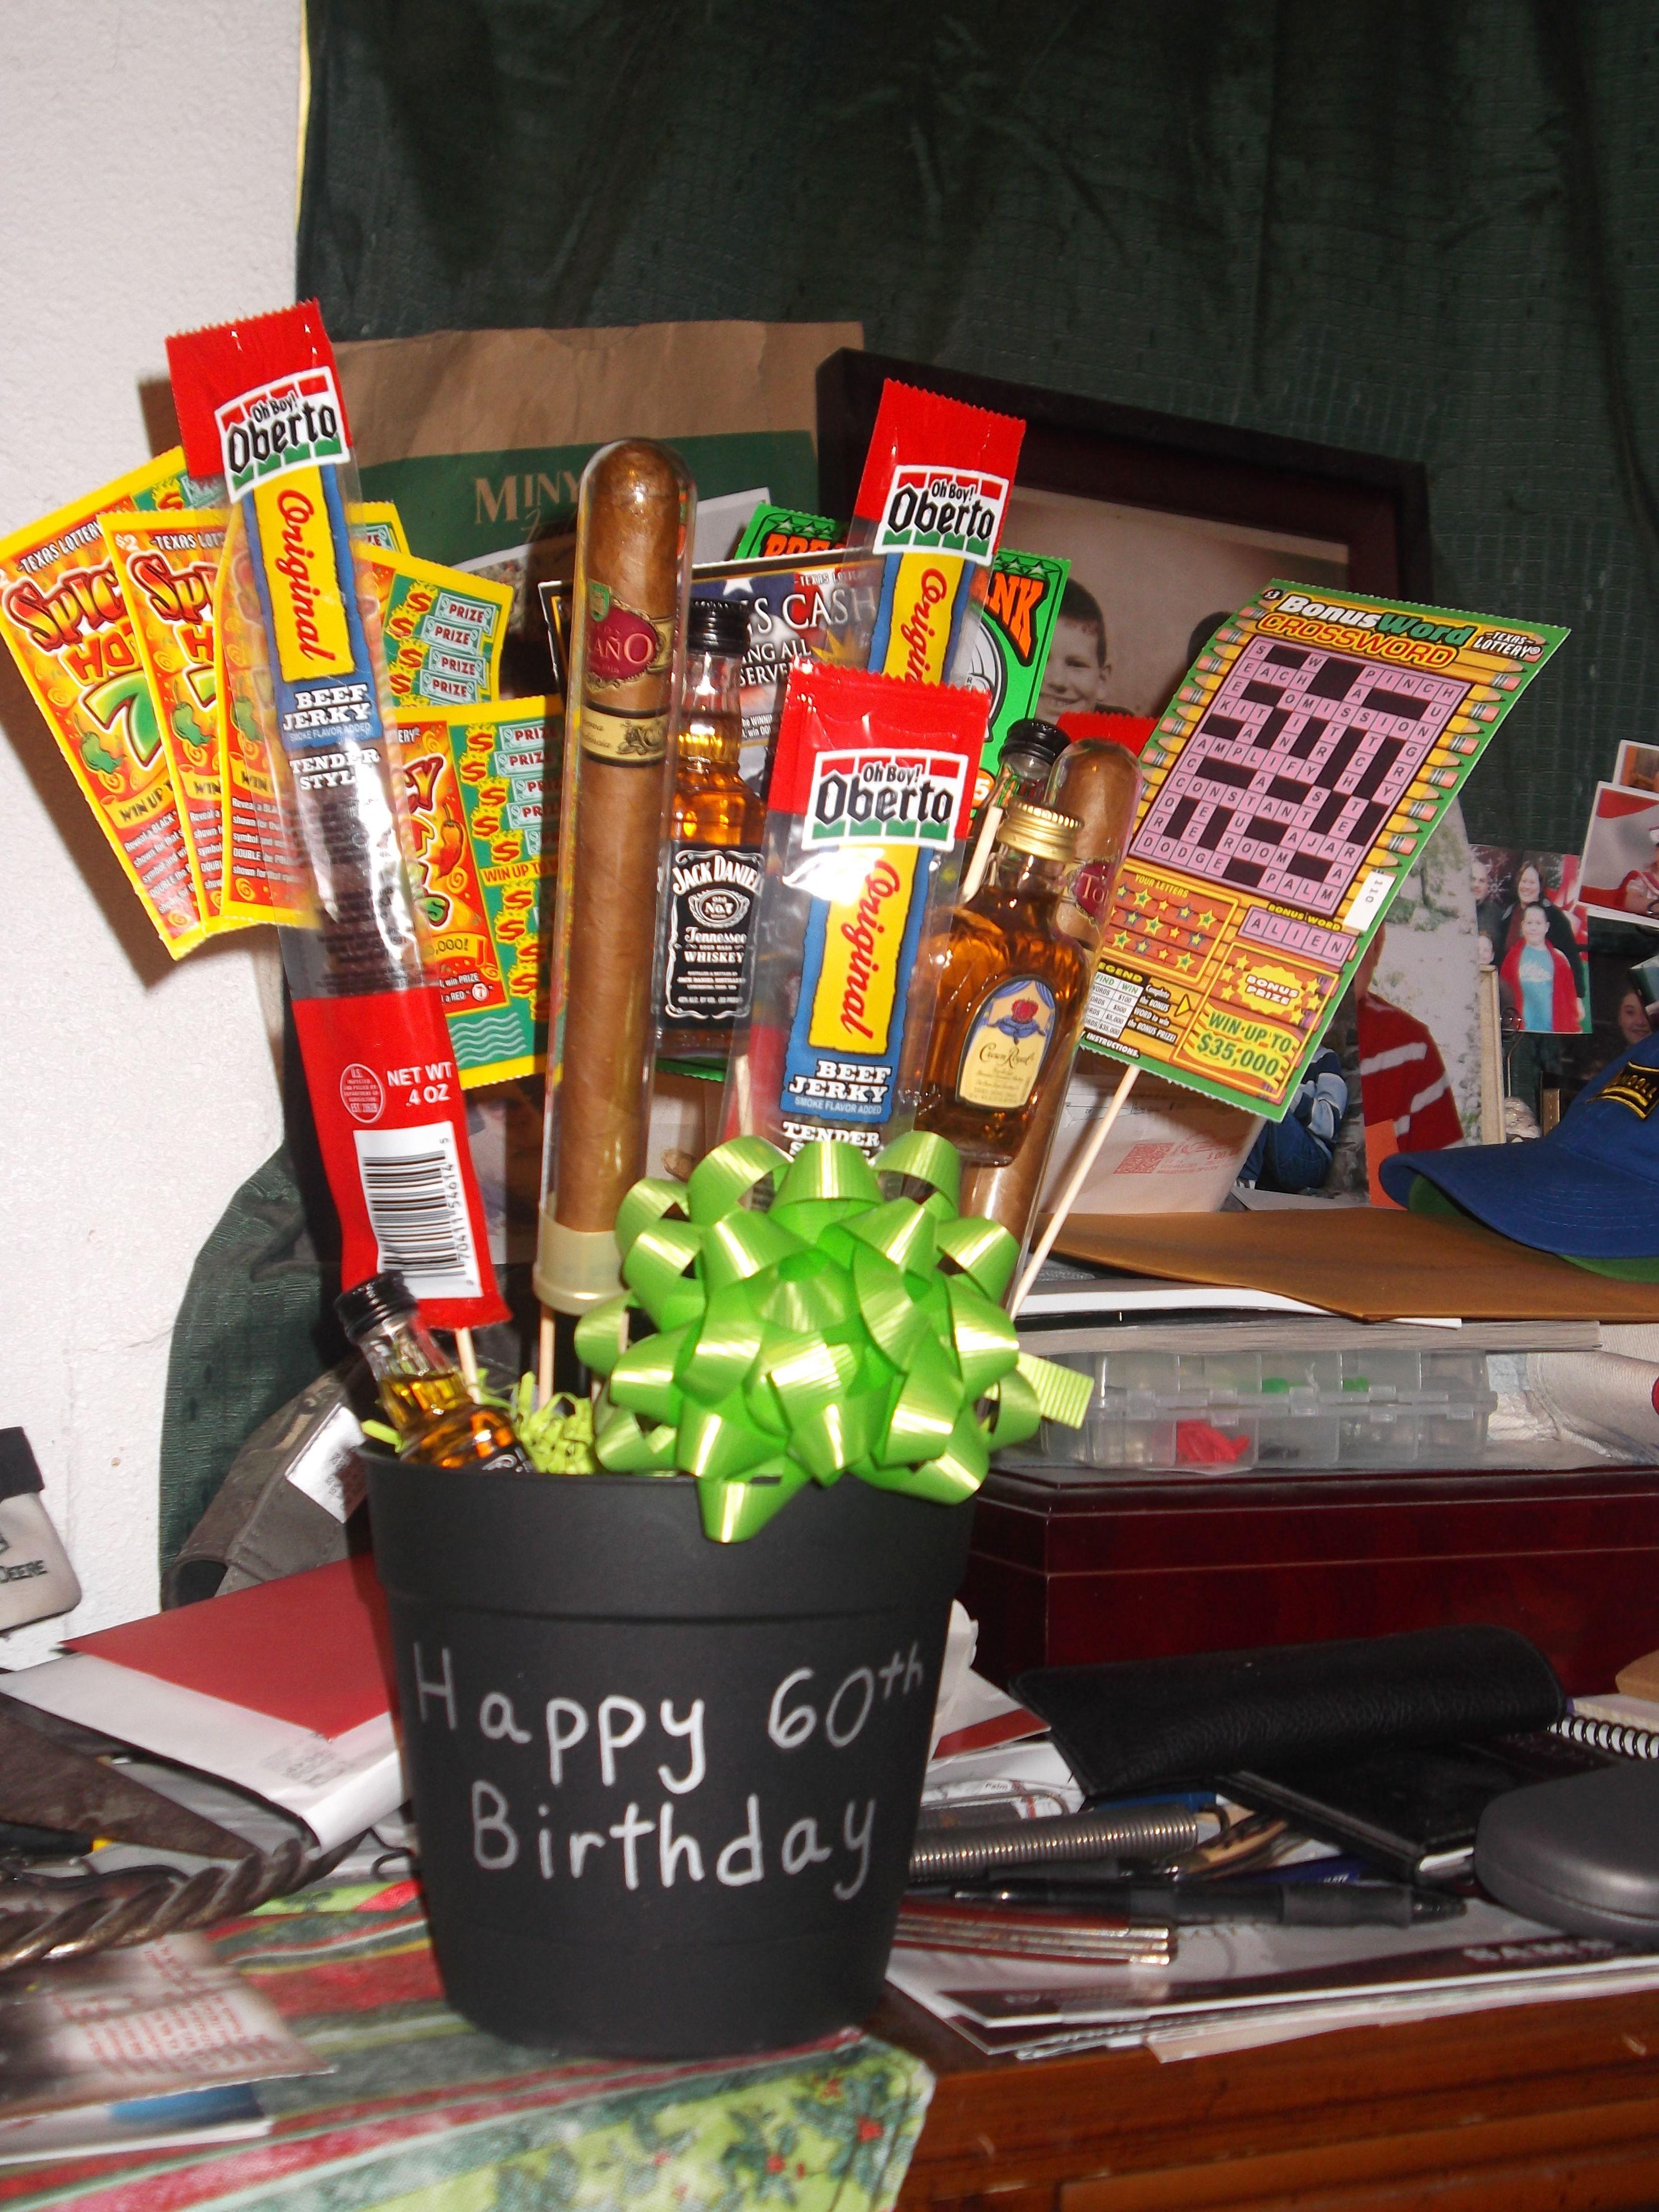 60th Birthday Gift Basket Ideas